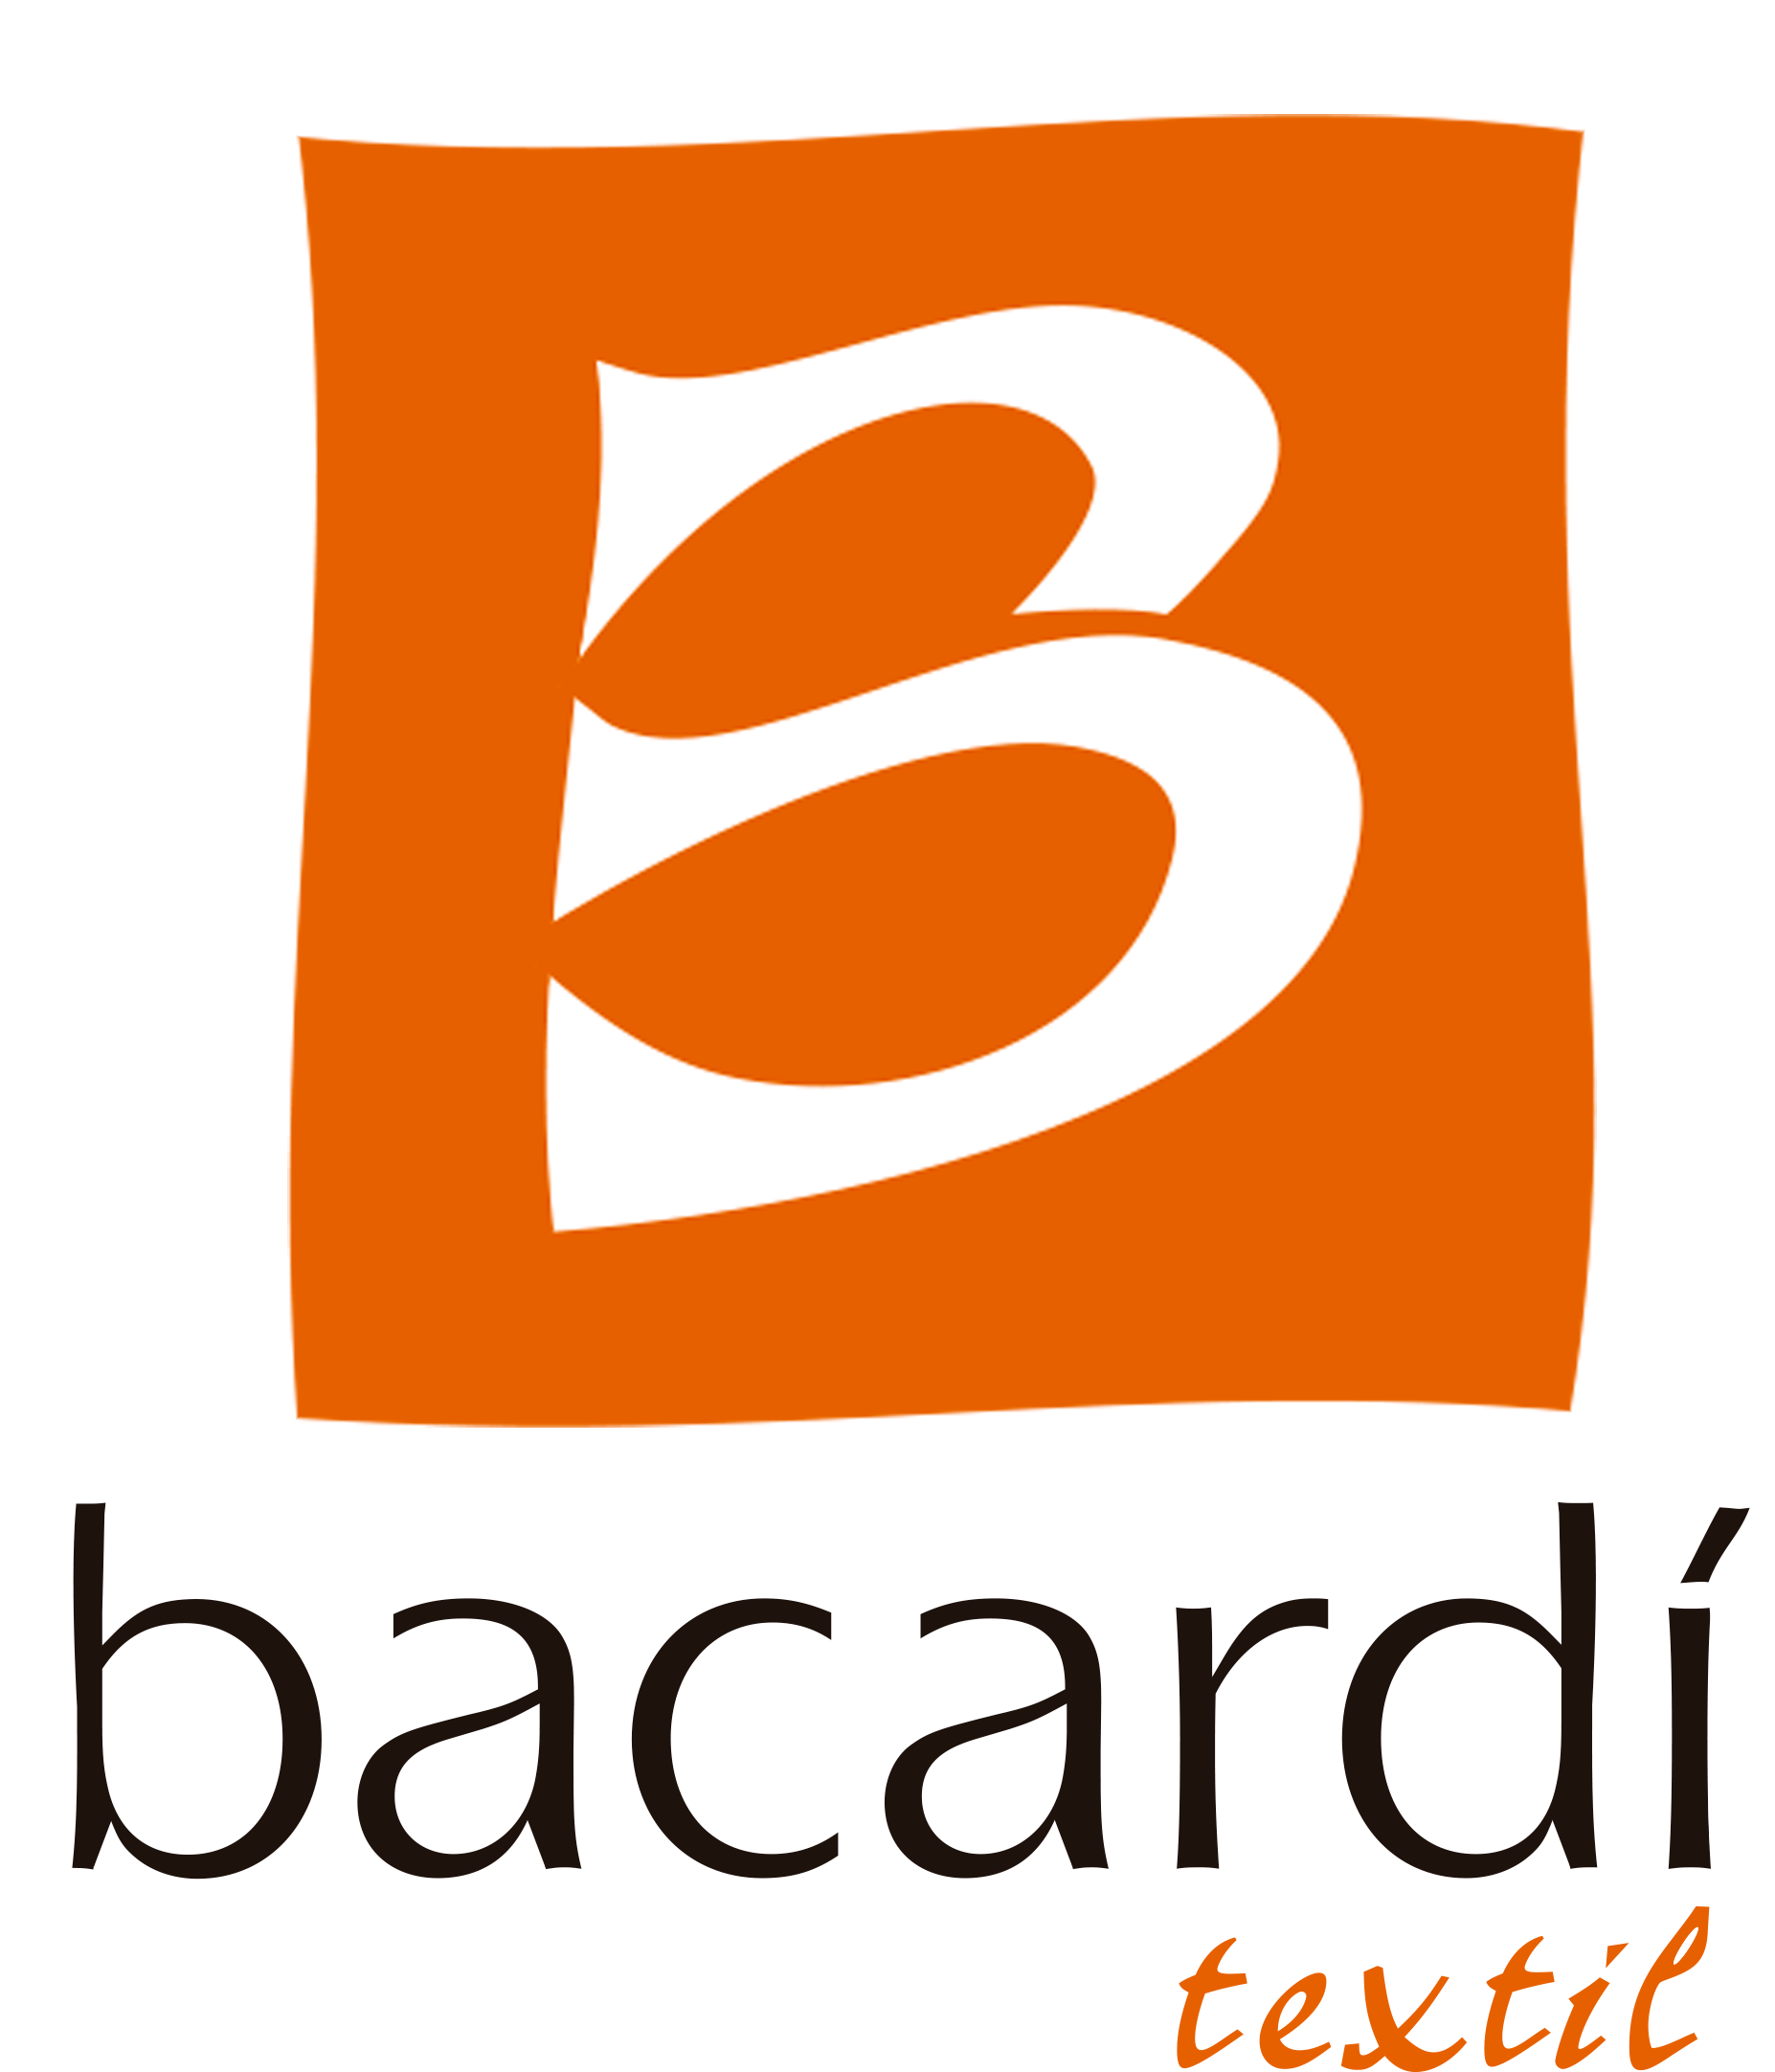 Bacardí Textil